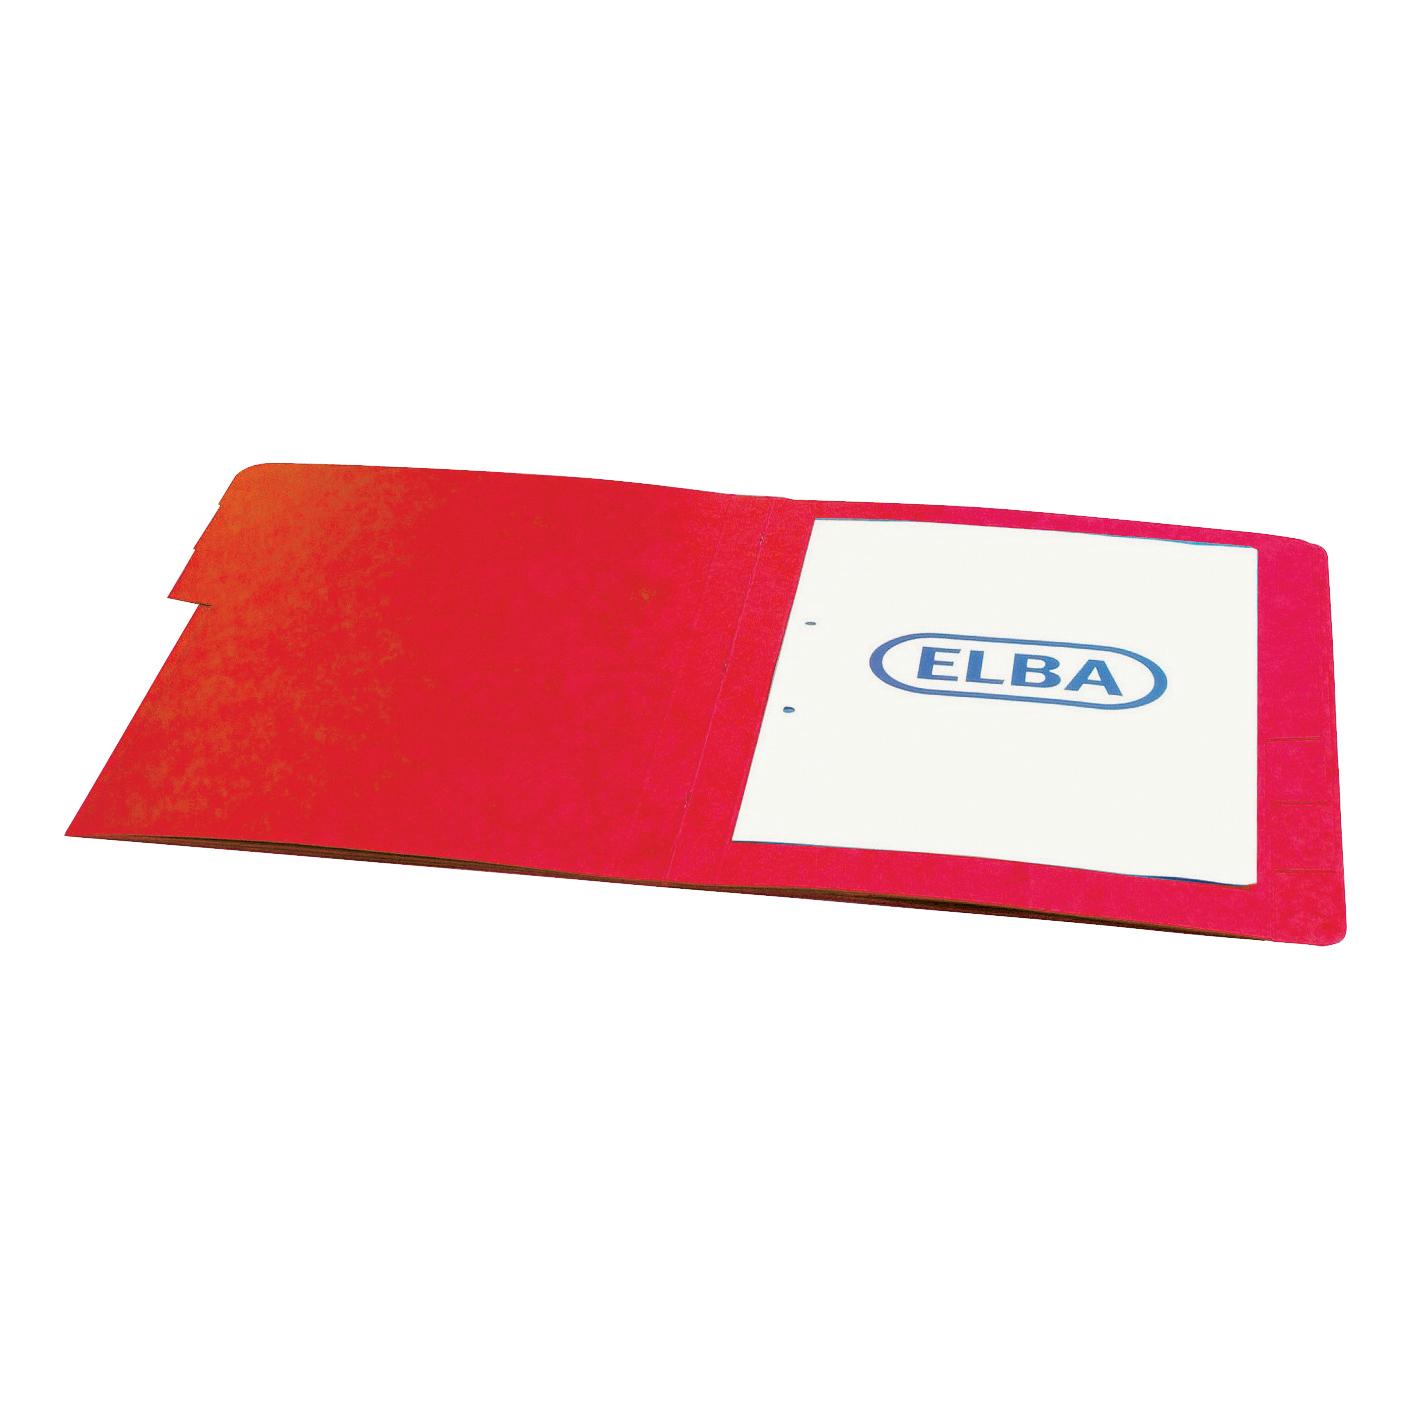 Elba Boston Part File 320gsm Manilla Elasticated 5-Part Foolscap Red Ref 100090167 Pack 5